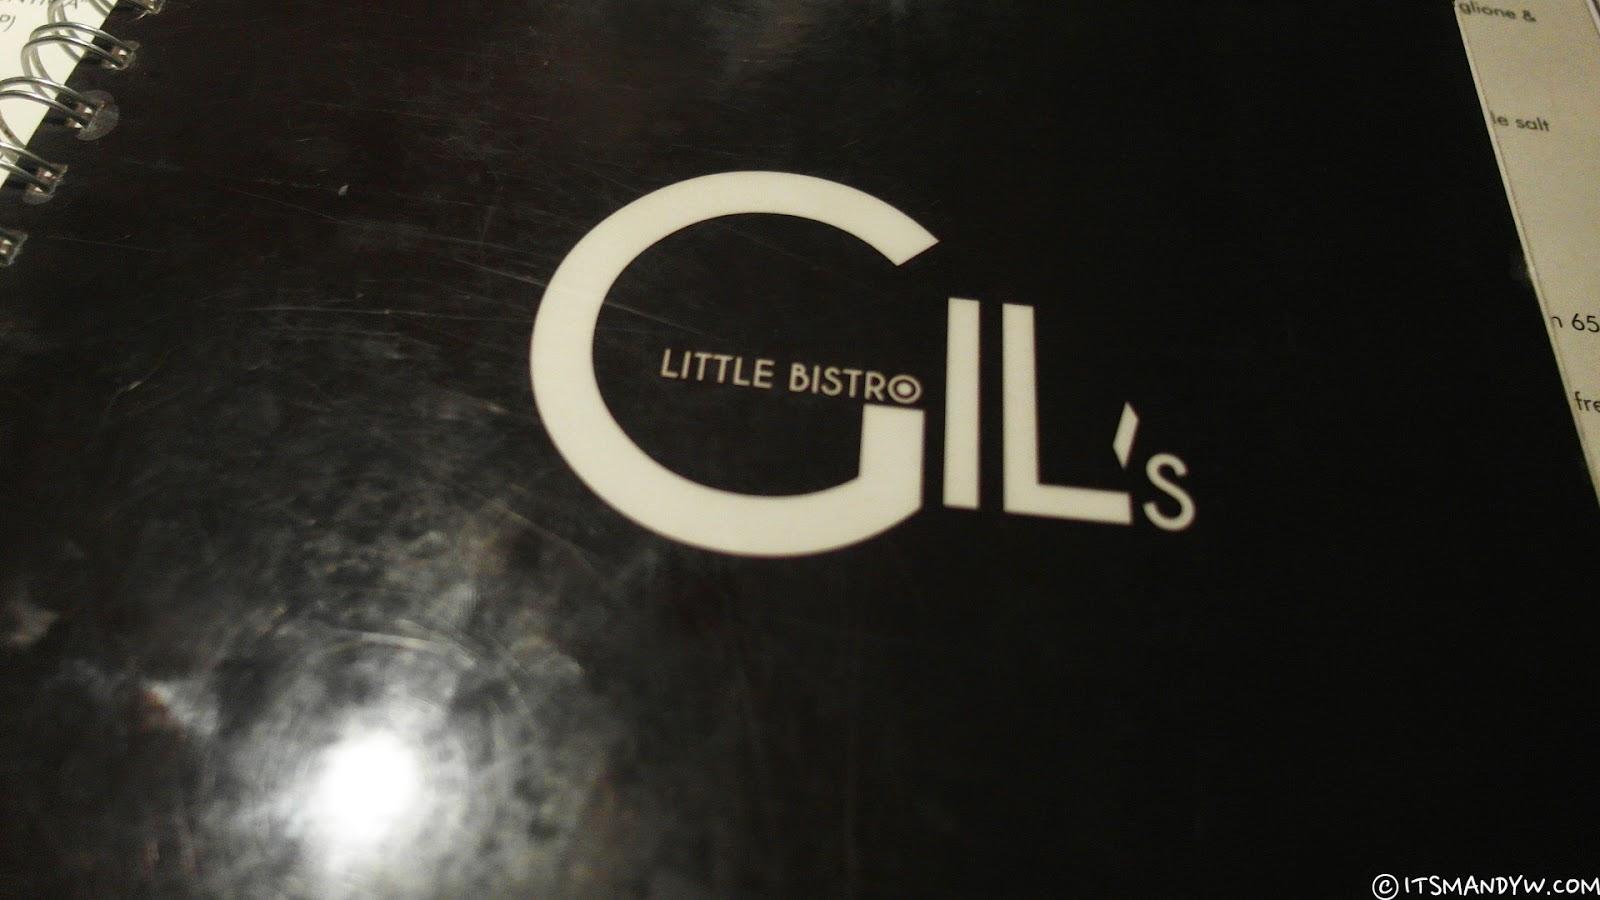 Gil's Little Bistro